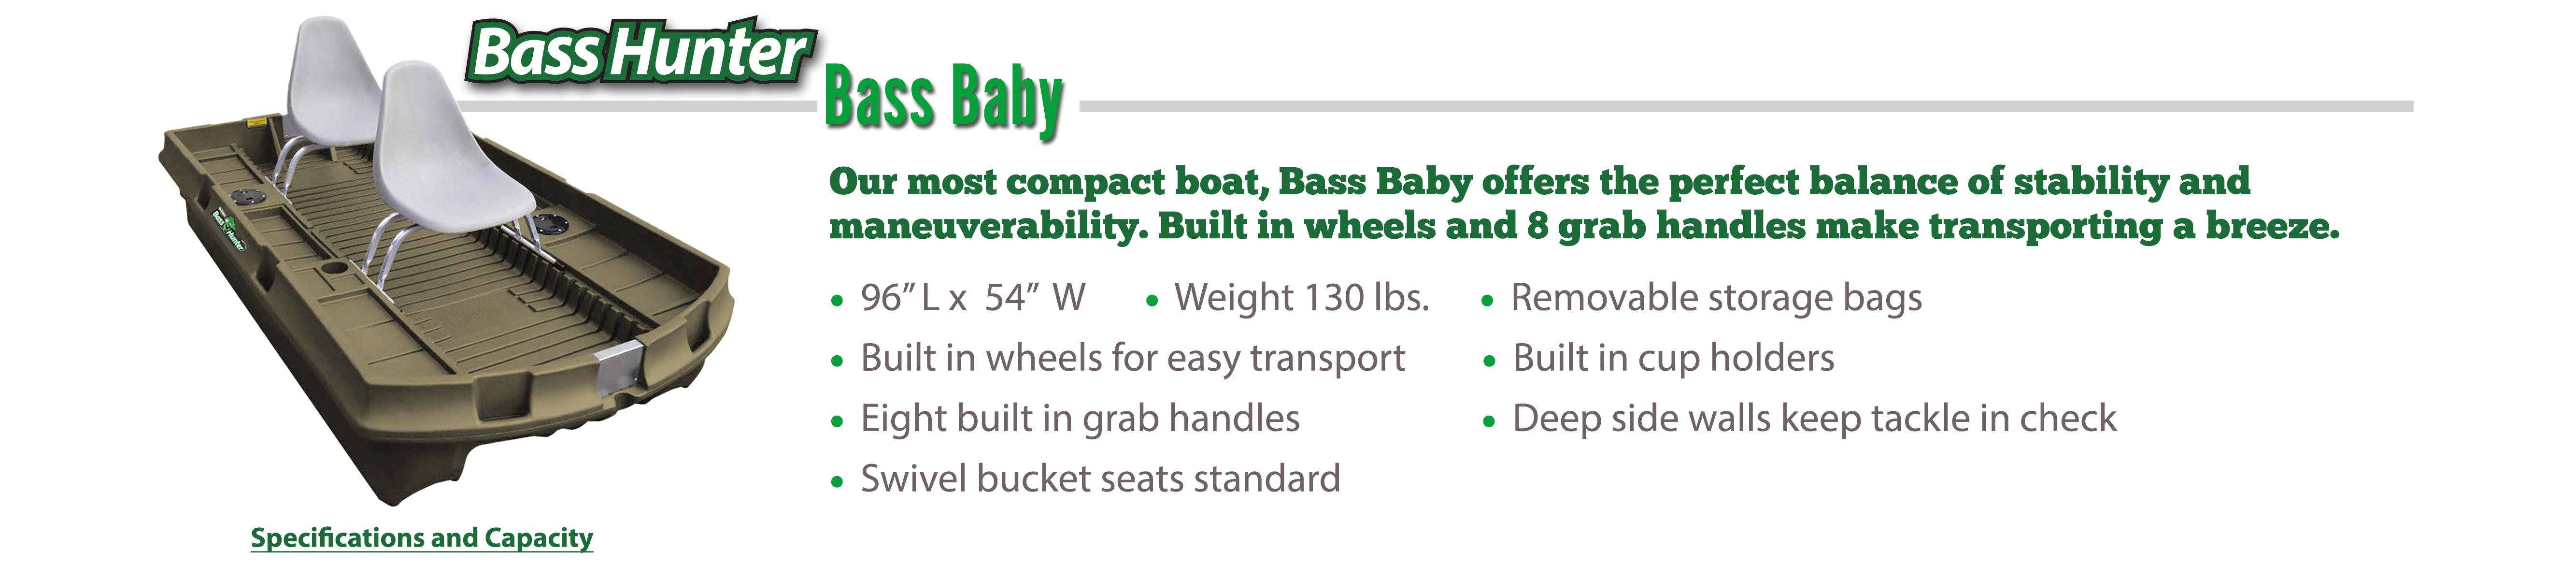 Bass Hunter Bass Baby